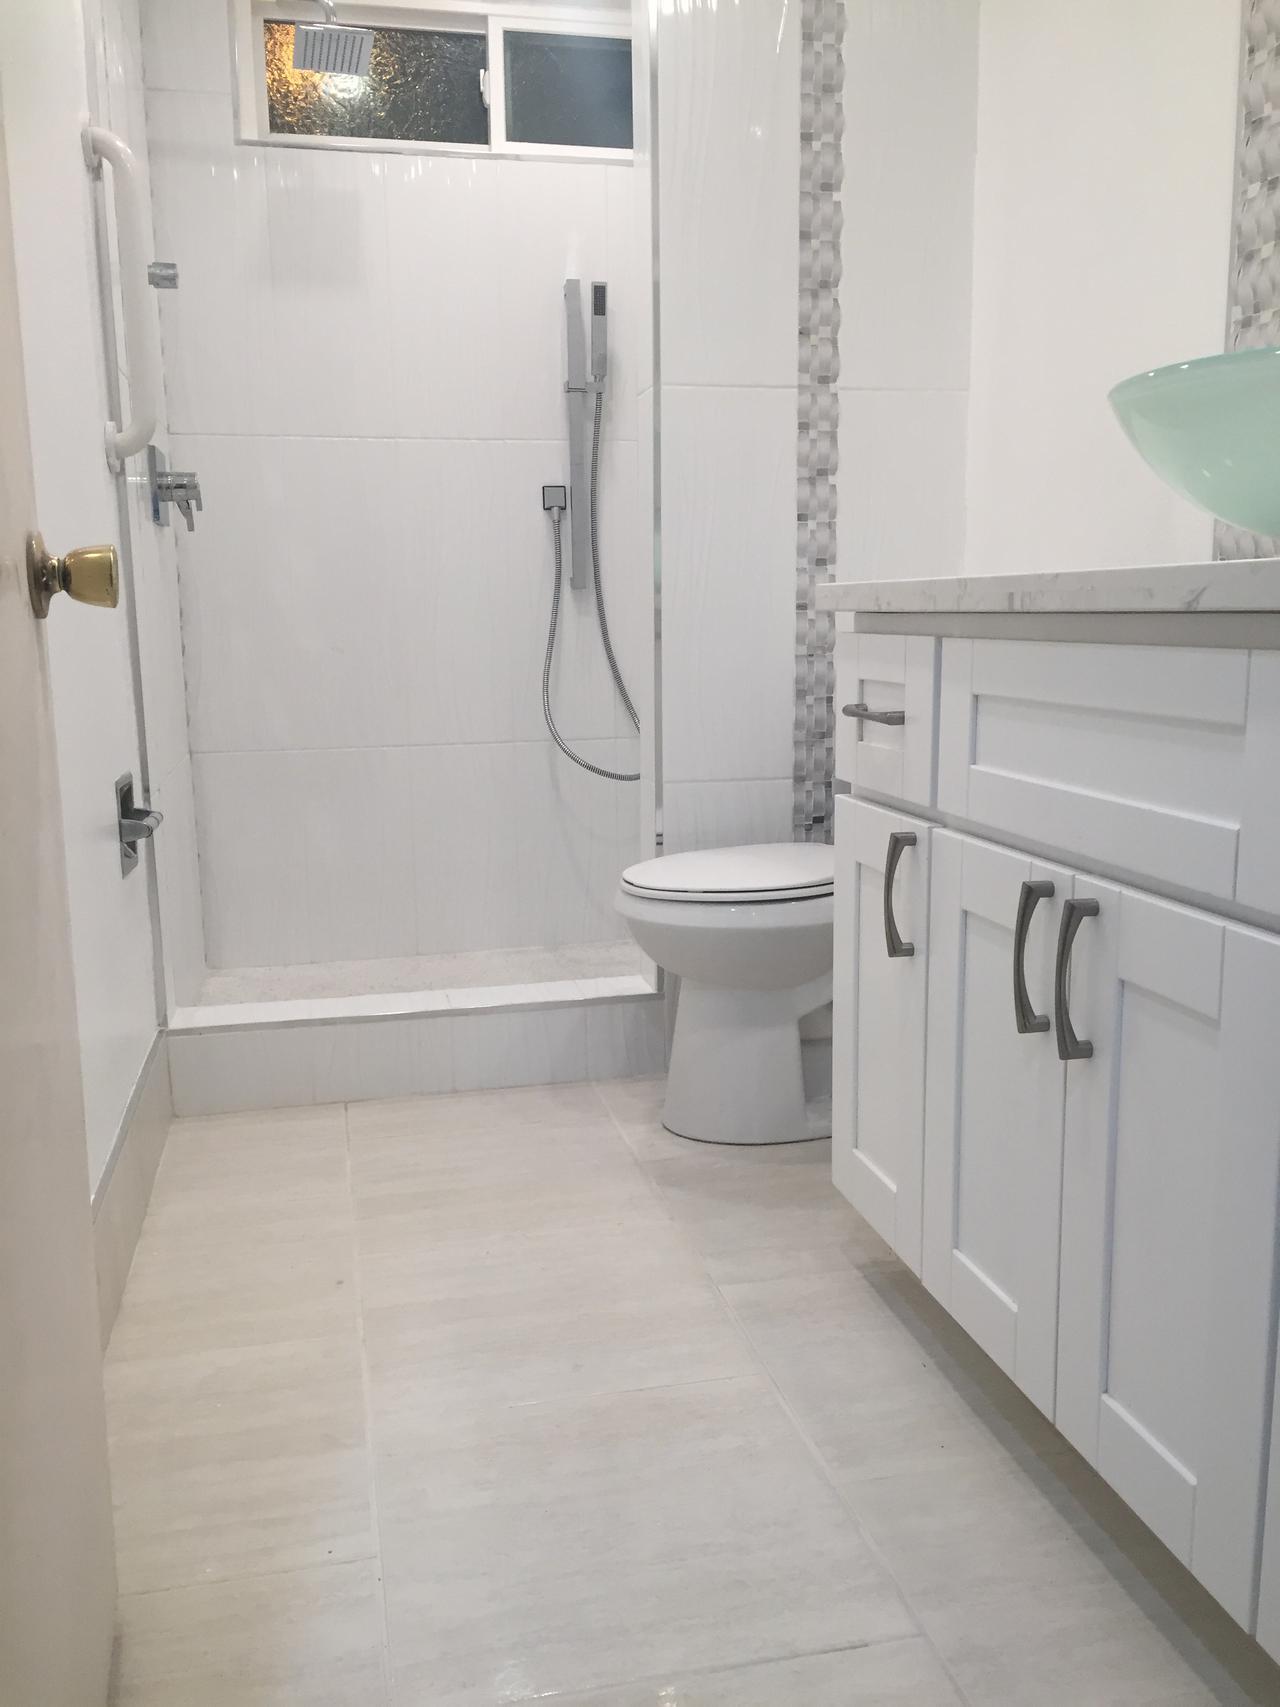 Trust Ollendorff Construction as your bathroom remodel contractors